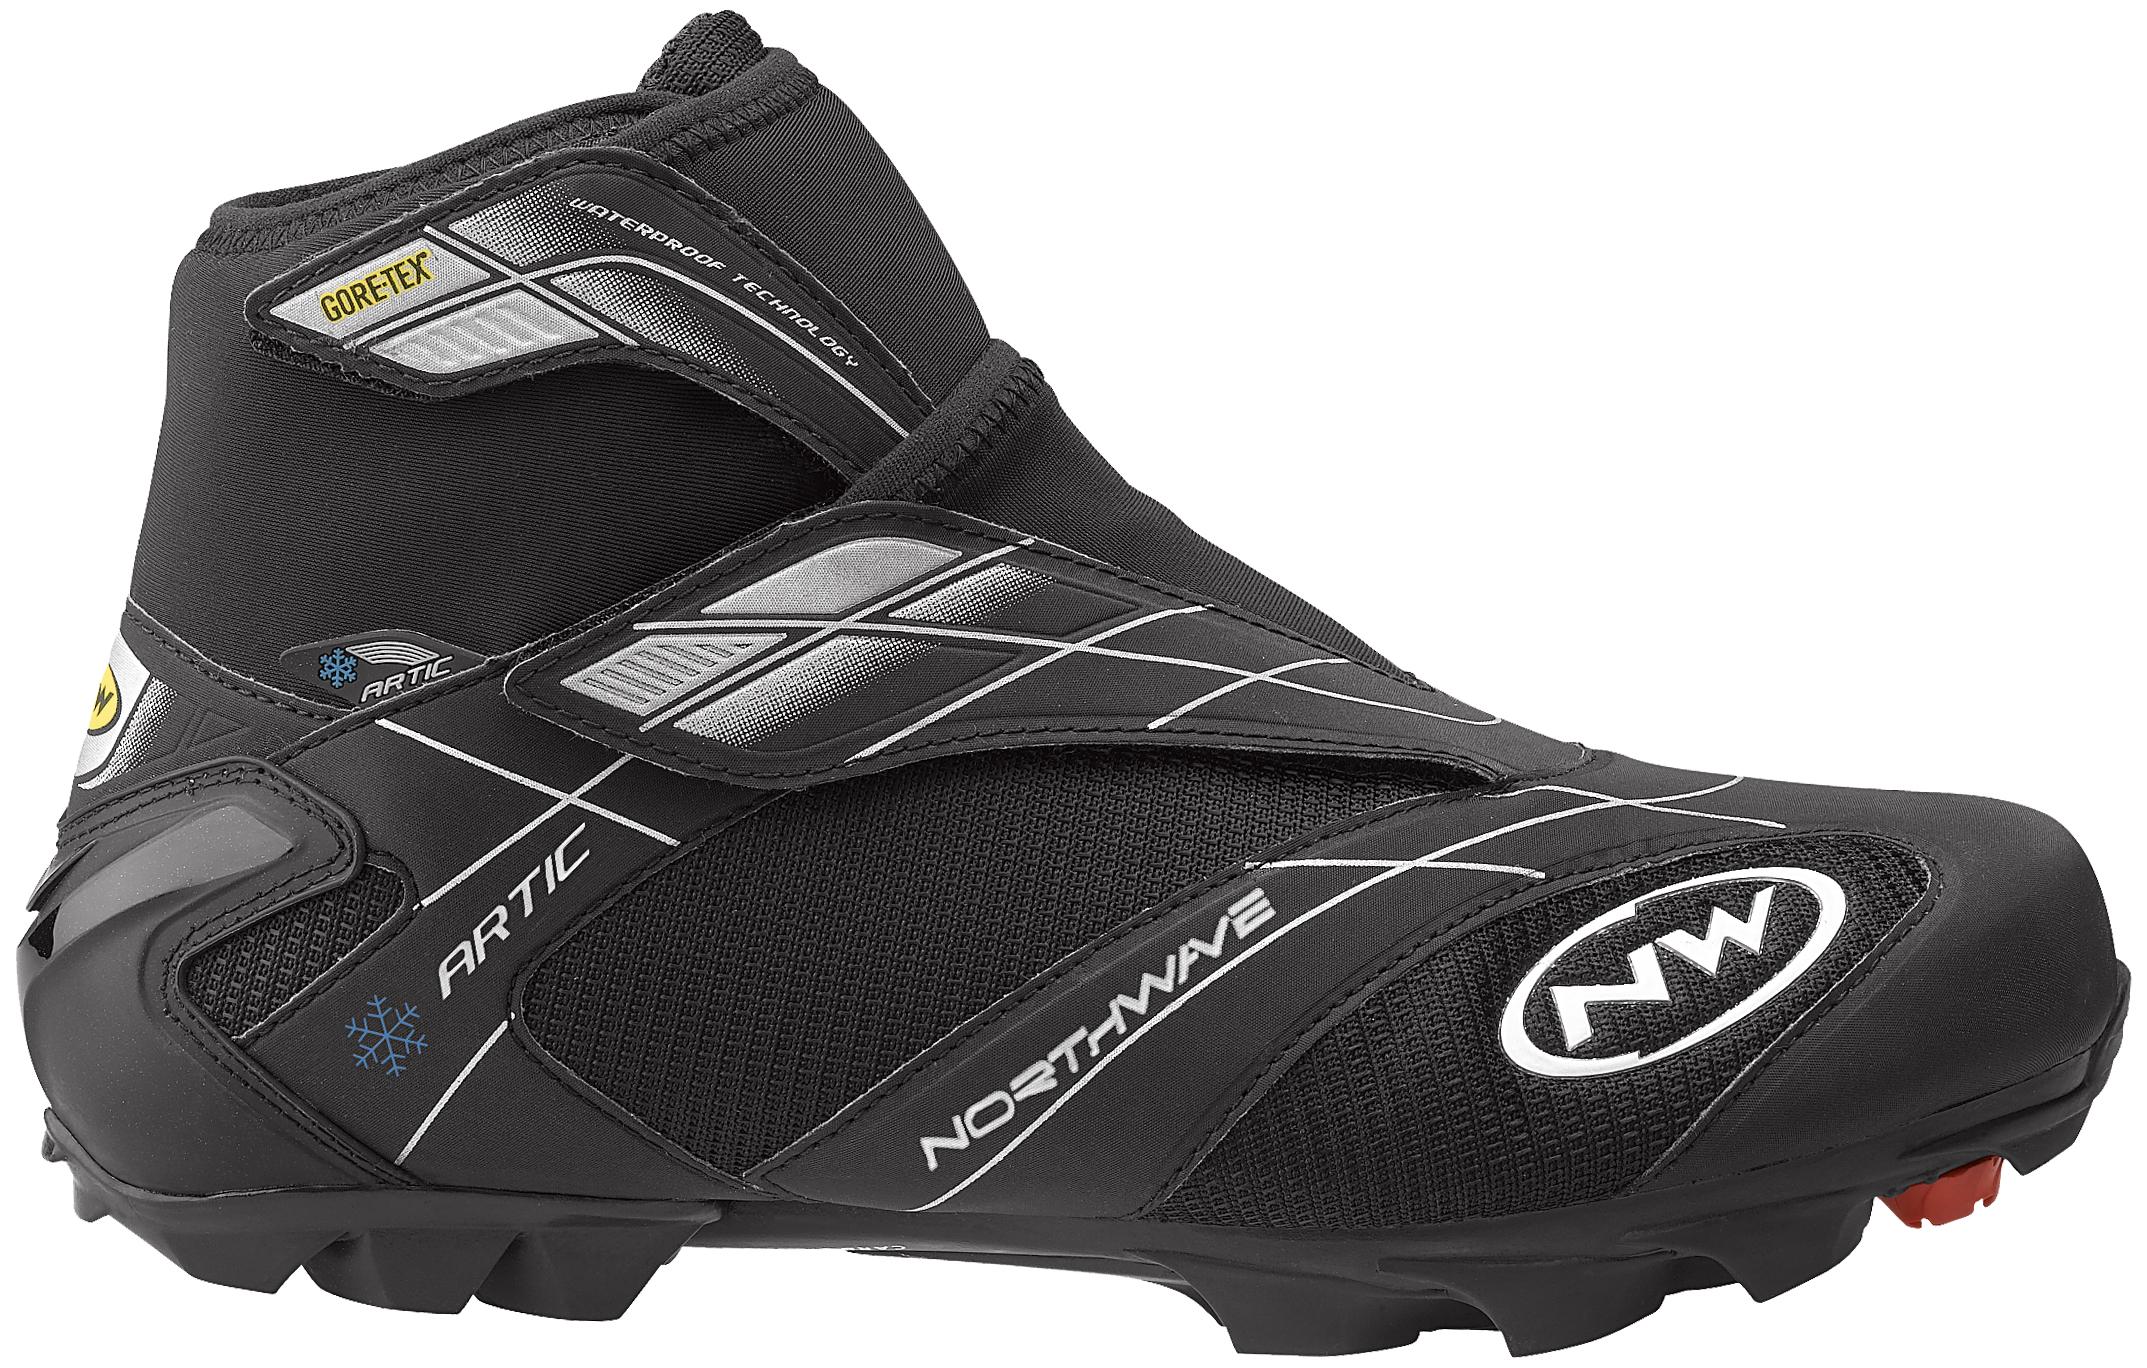 Northwave Celsius Arctic Cycling Shoes